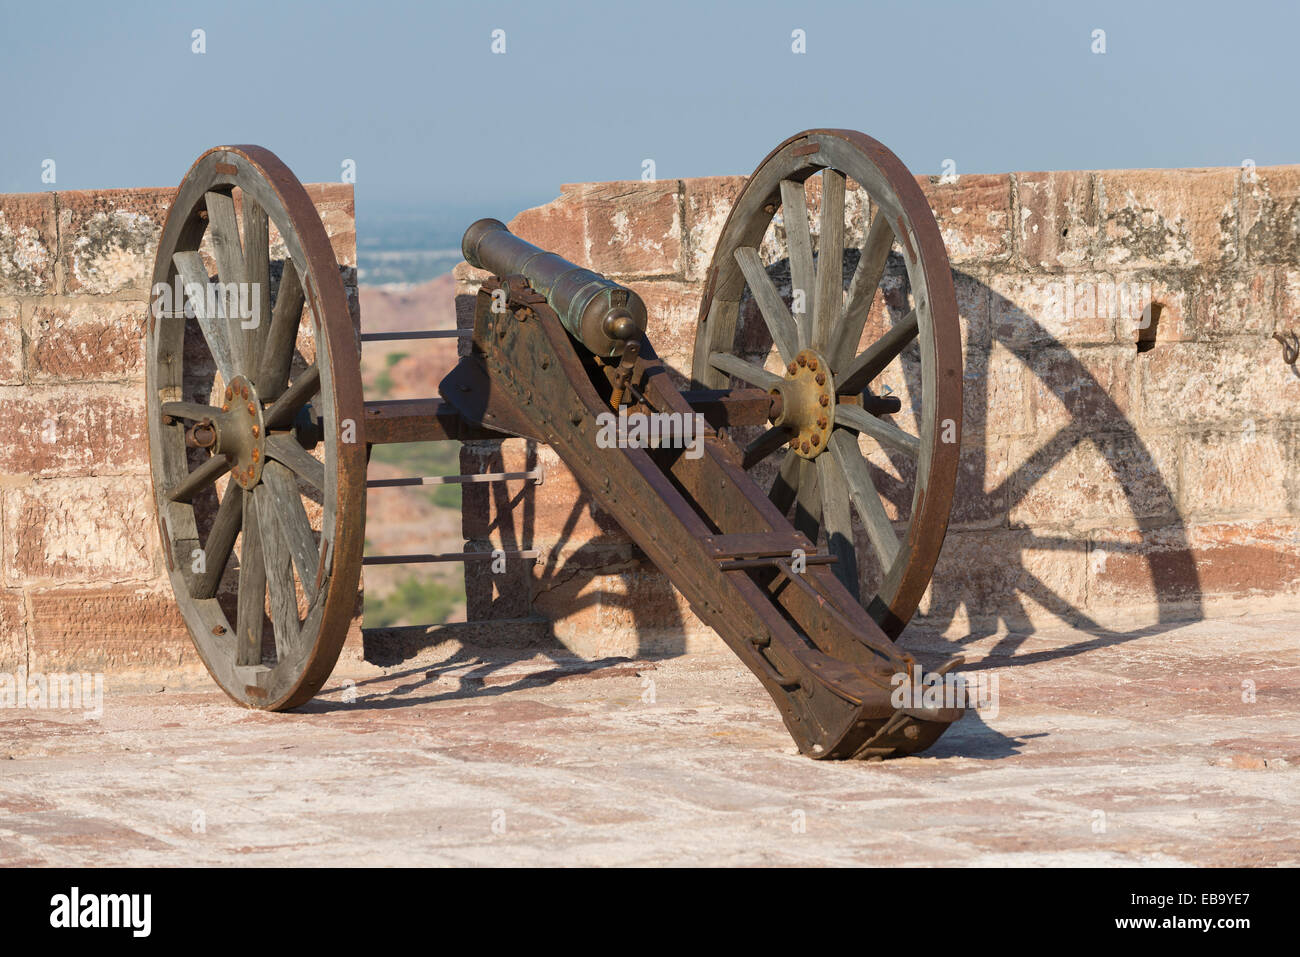 Historic mobile cannon, Mehrangarh Fort, Jodhpur, Rajasthan, India - Stock Image